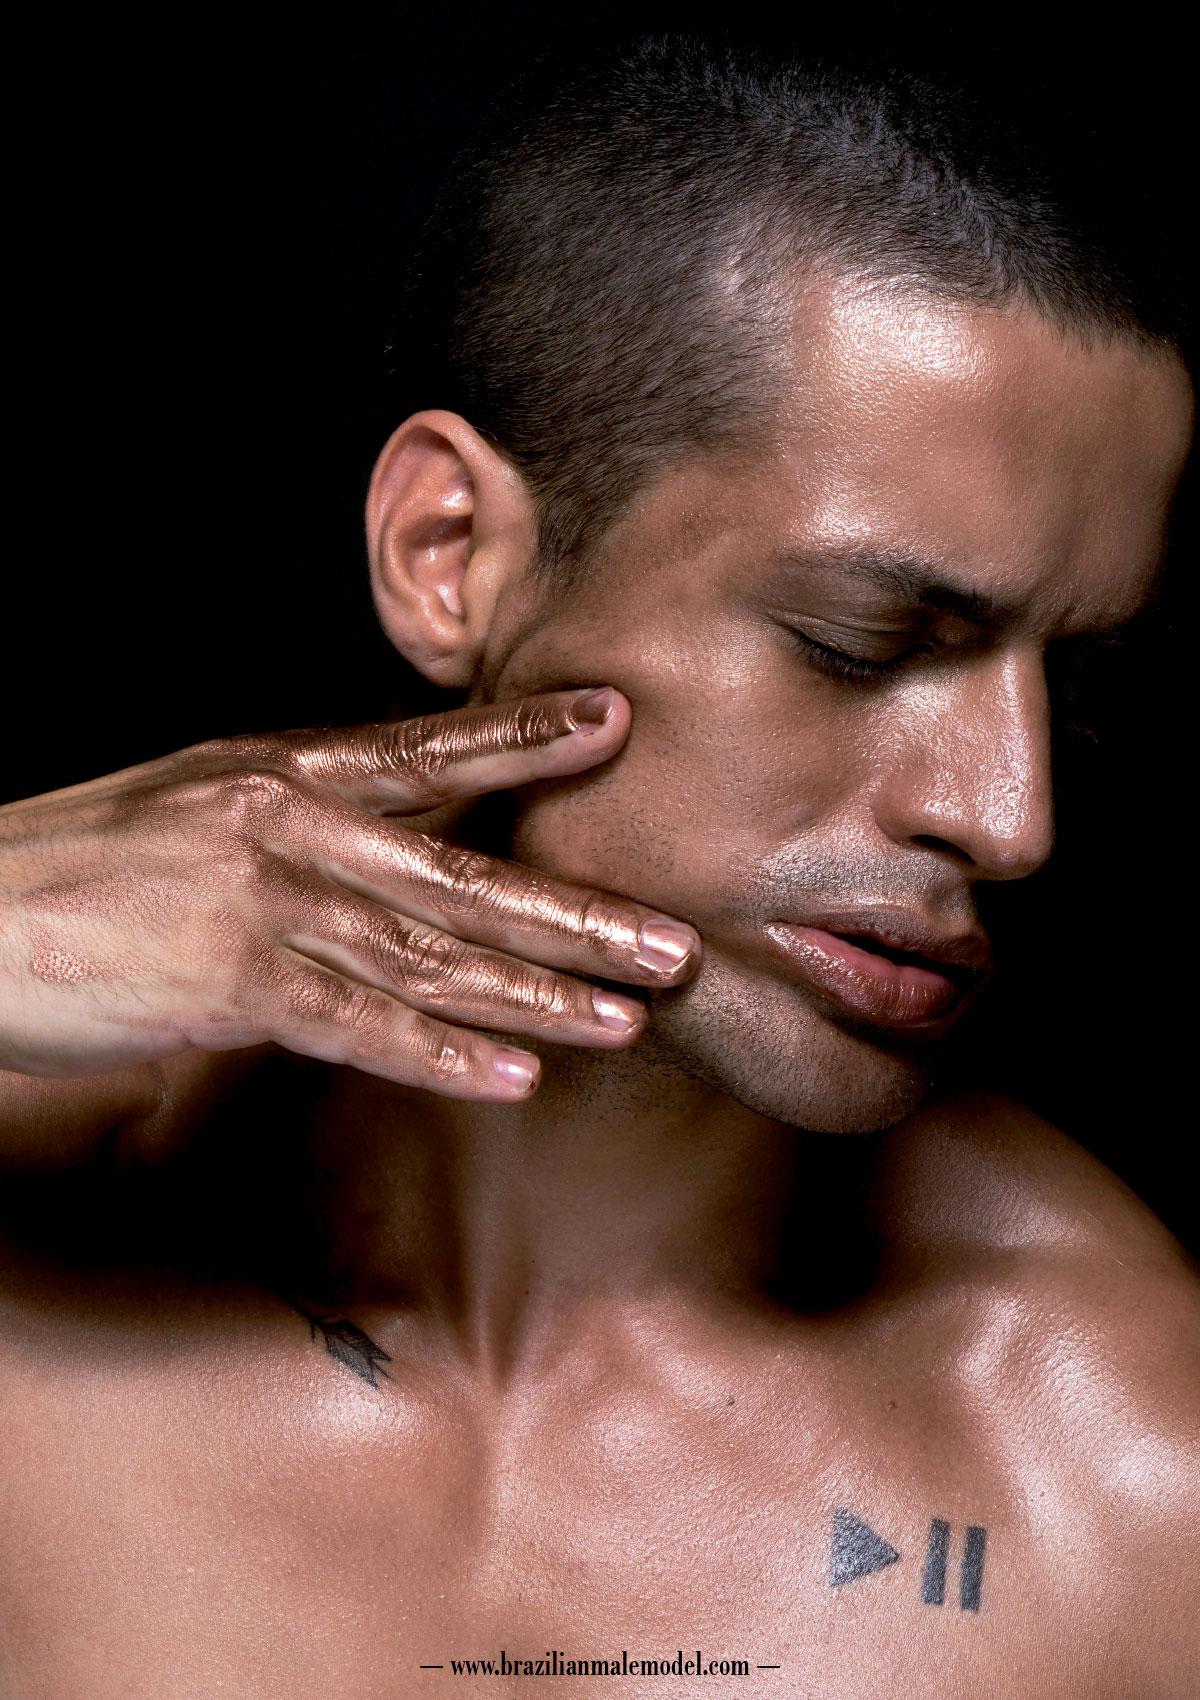 Jonathan Rosa by Anderson Macedo for Brazilian Male Model Magazine#2